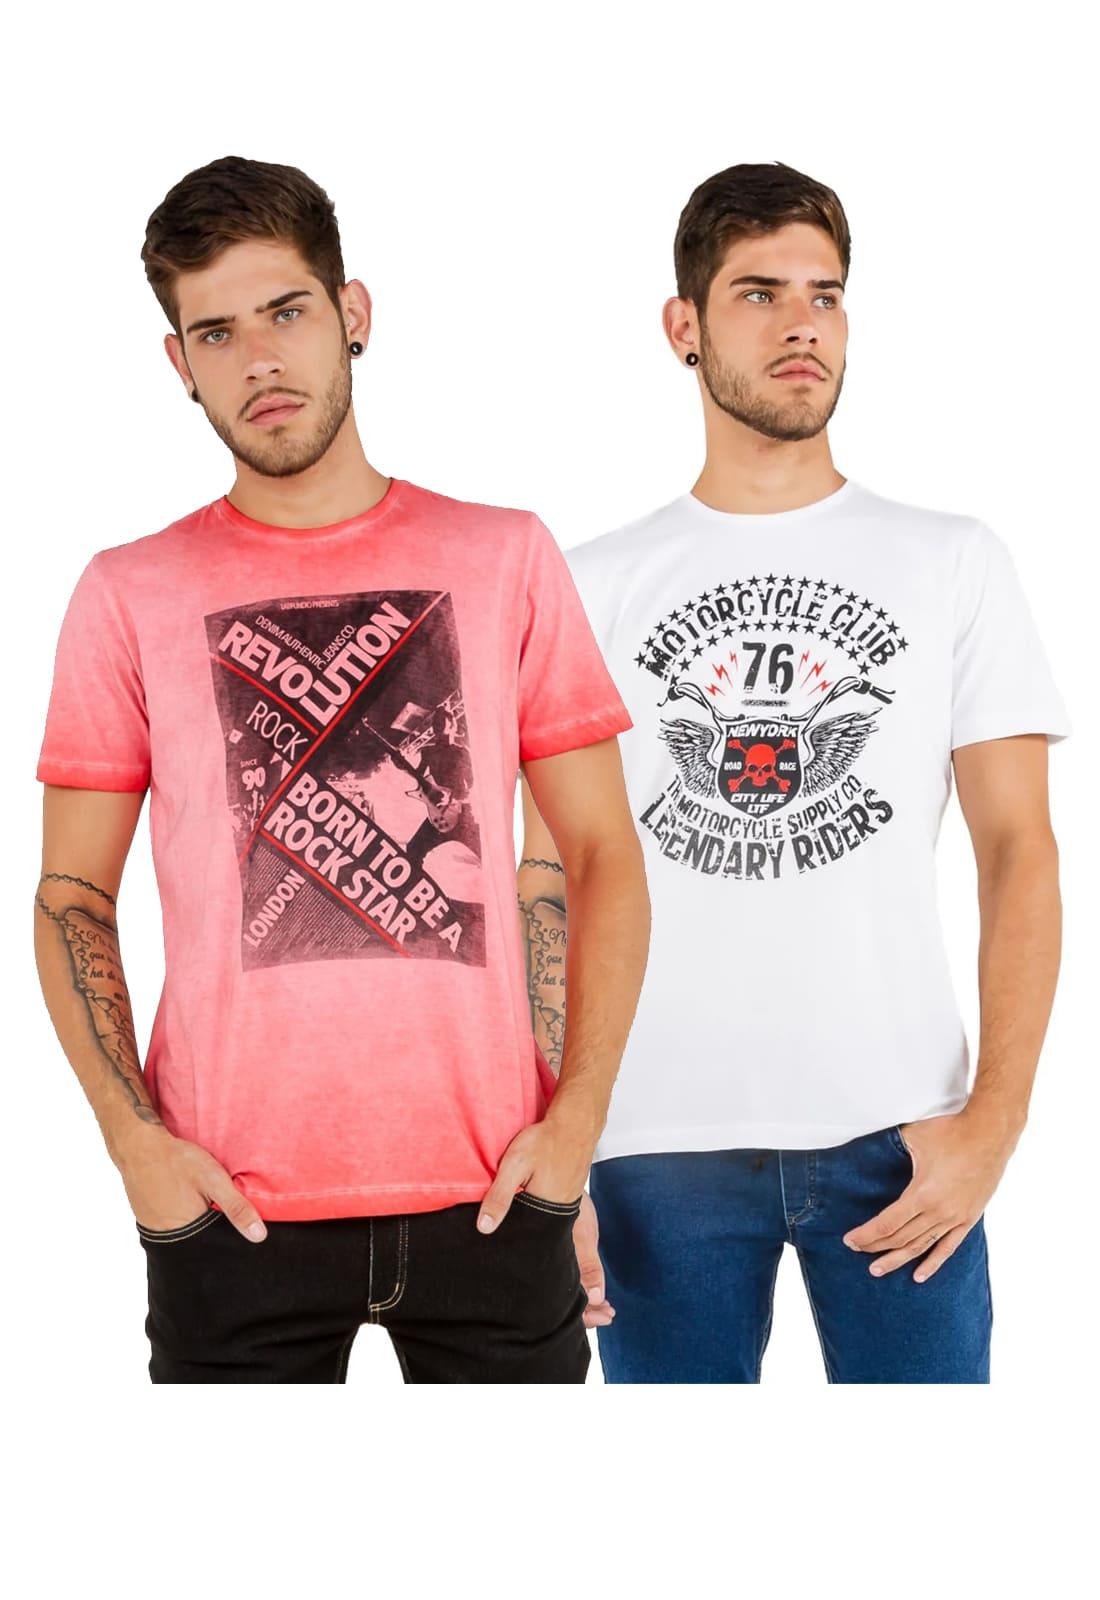 2 T-shirts Masculina - Estampa Rock Star - Motorcycle Club